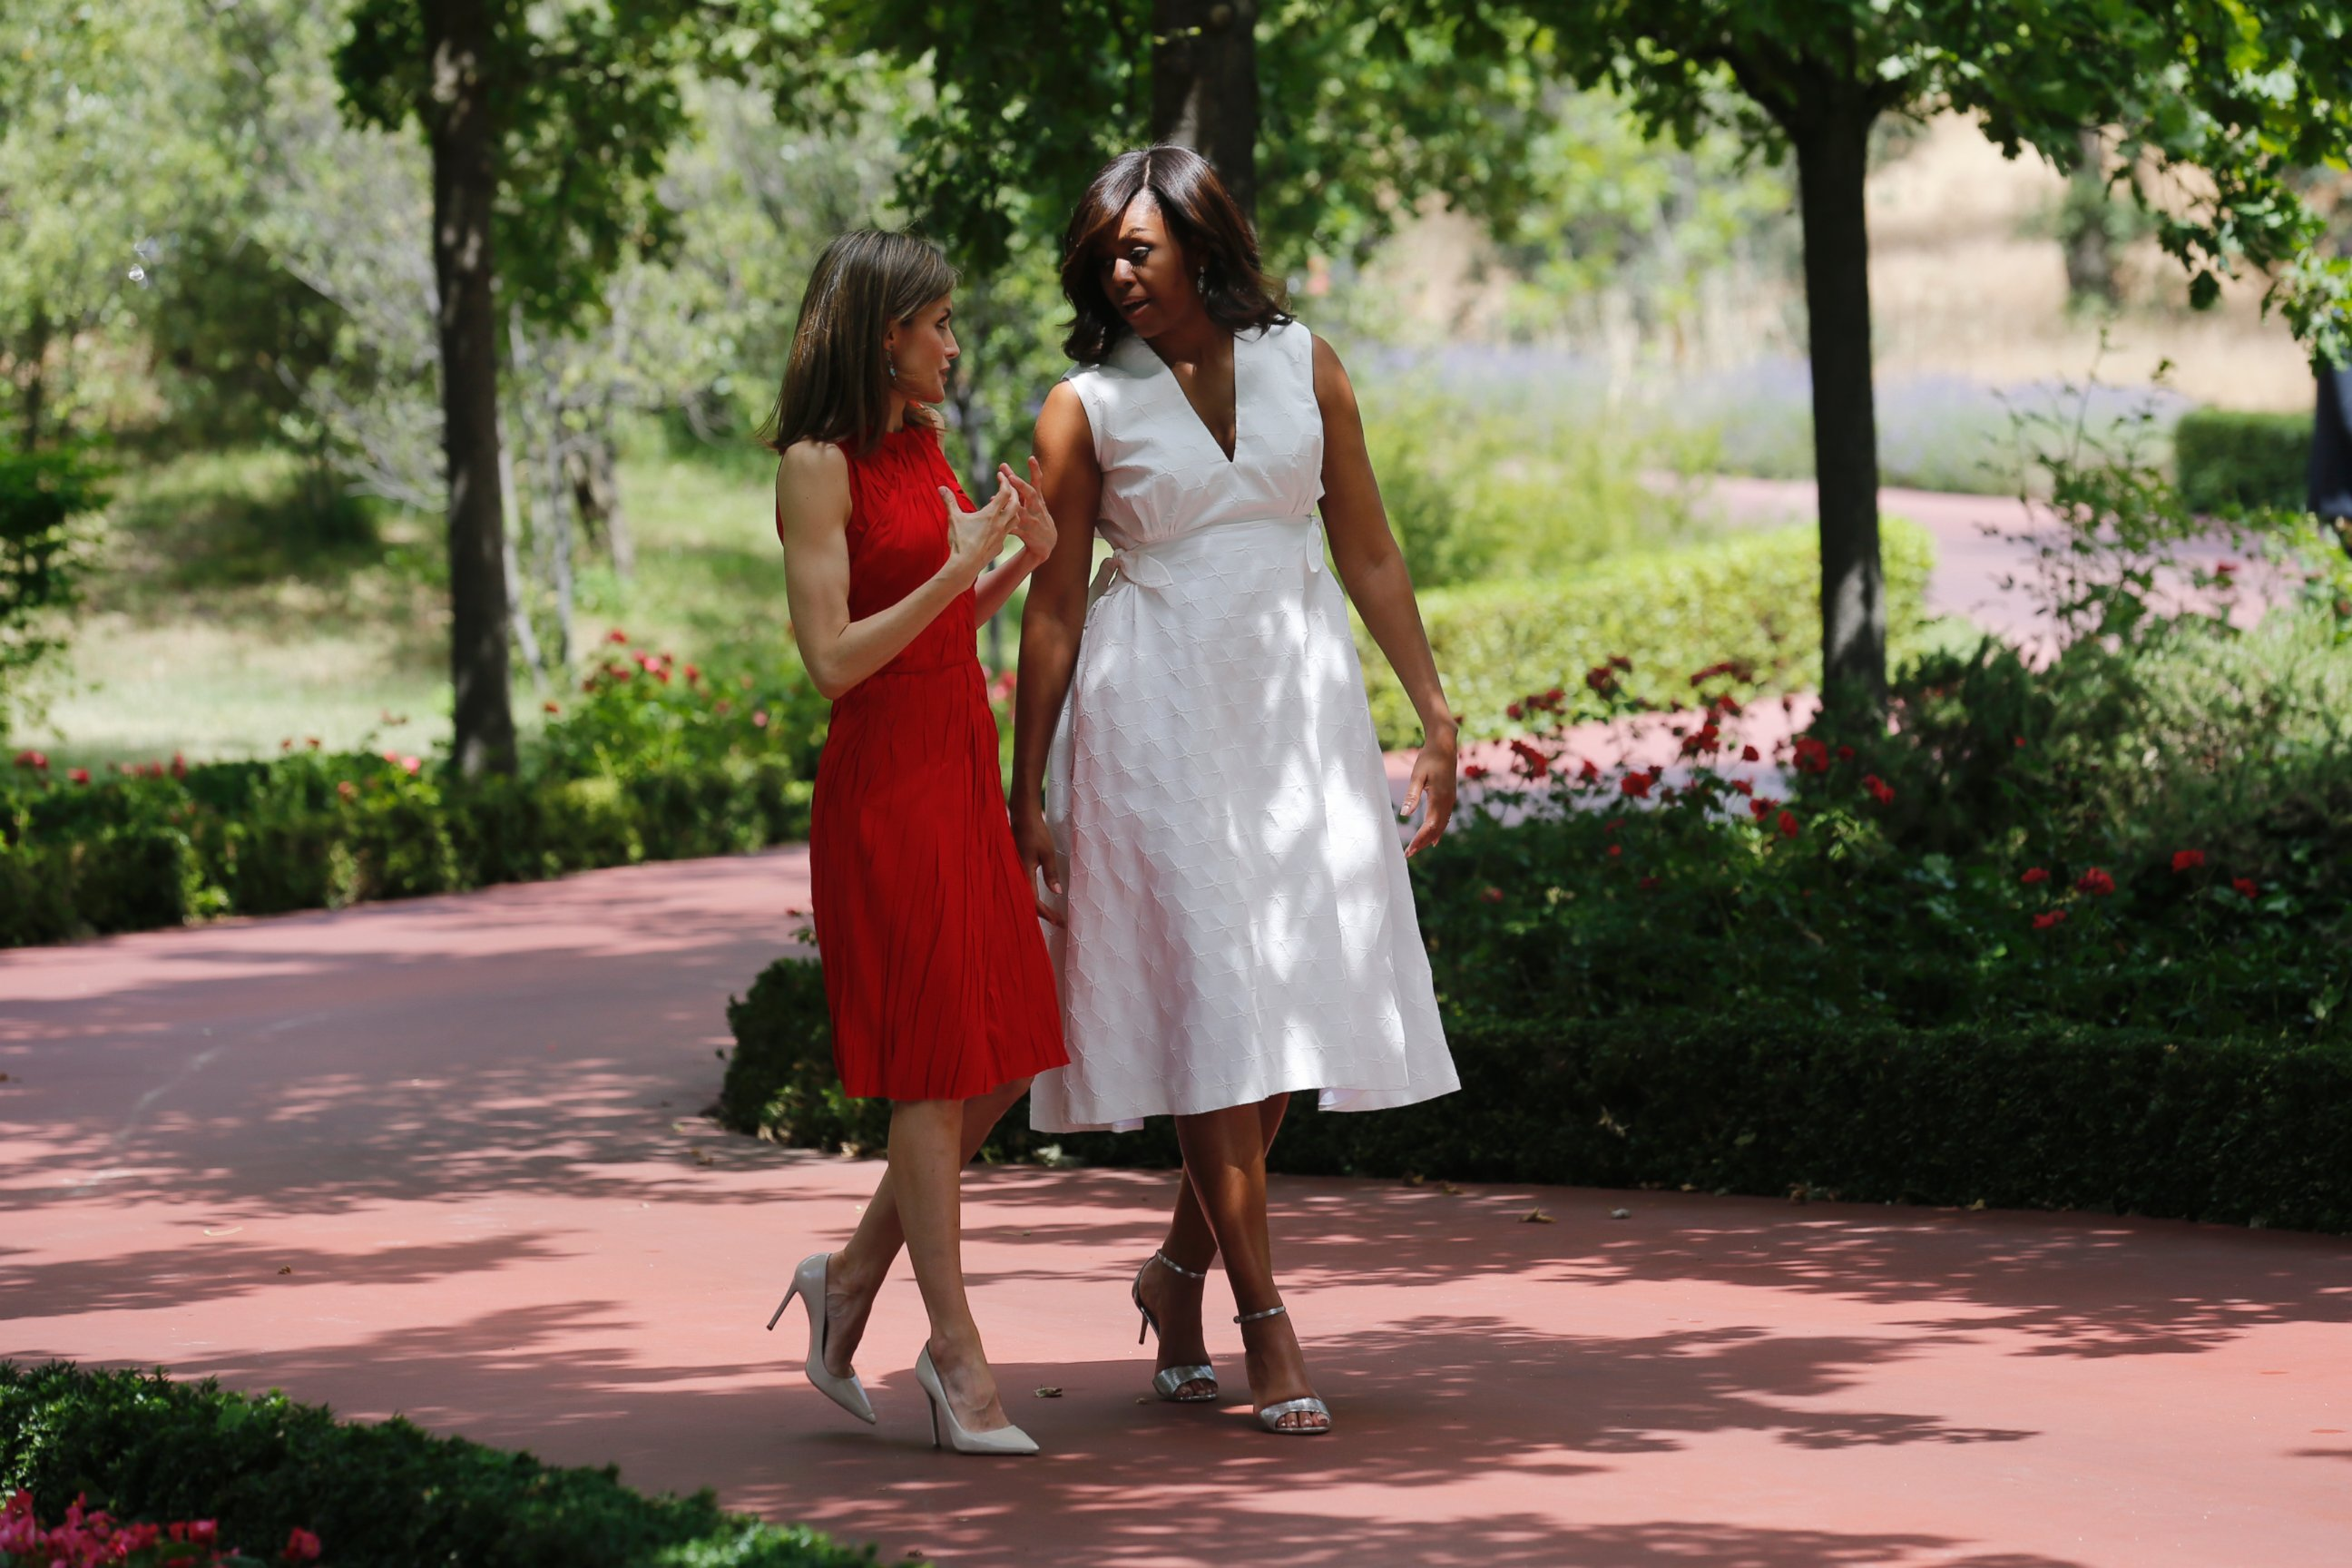 Michelle Obama Visits Madrid